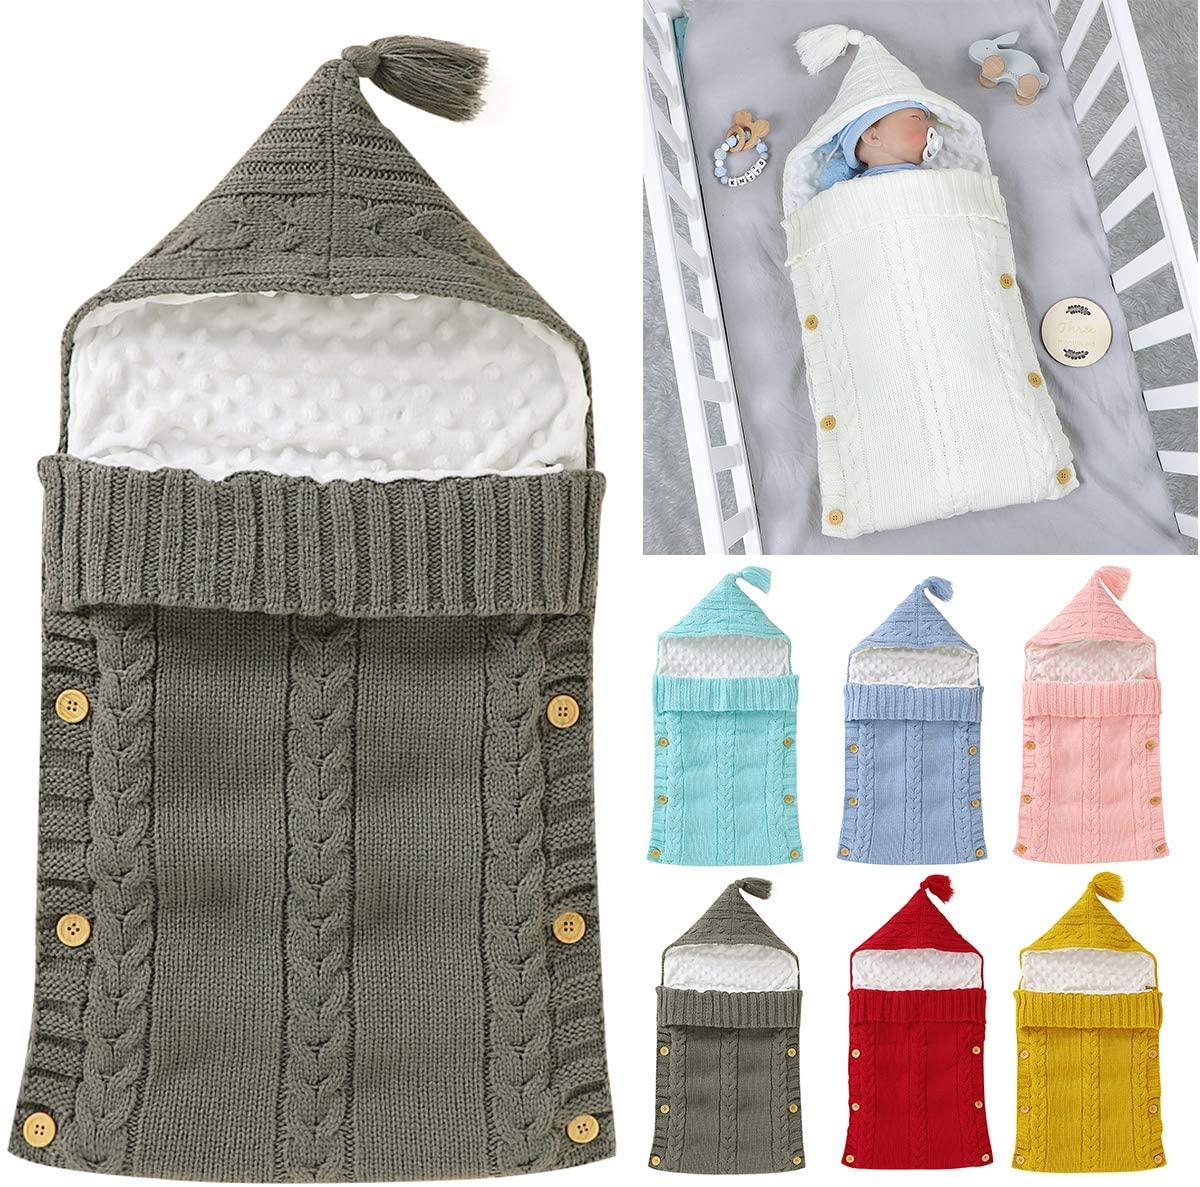 Baby Knit Sleeping Bag,Newborn Swaddle Wrap Blanket Infant Minky Dot Stroller Sleep Bag Sack for 0-6M Babies Boys Girls